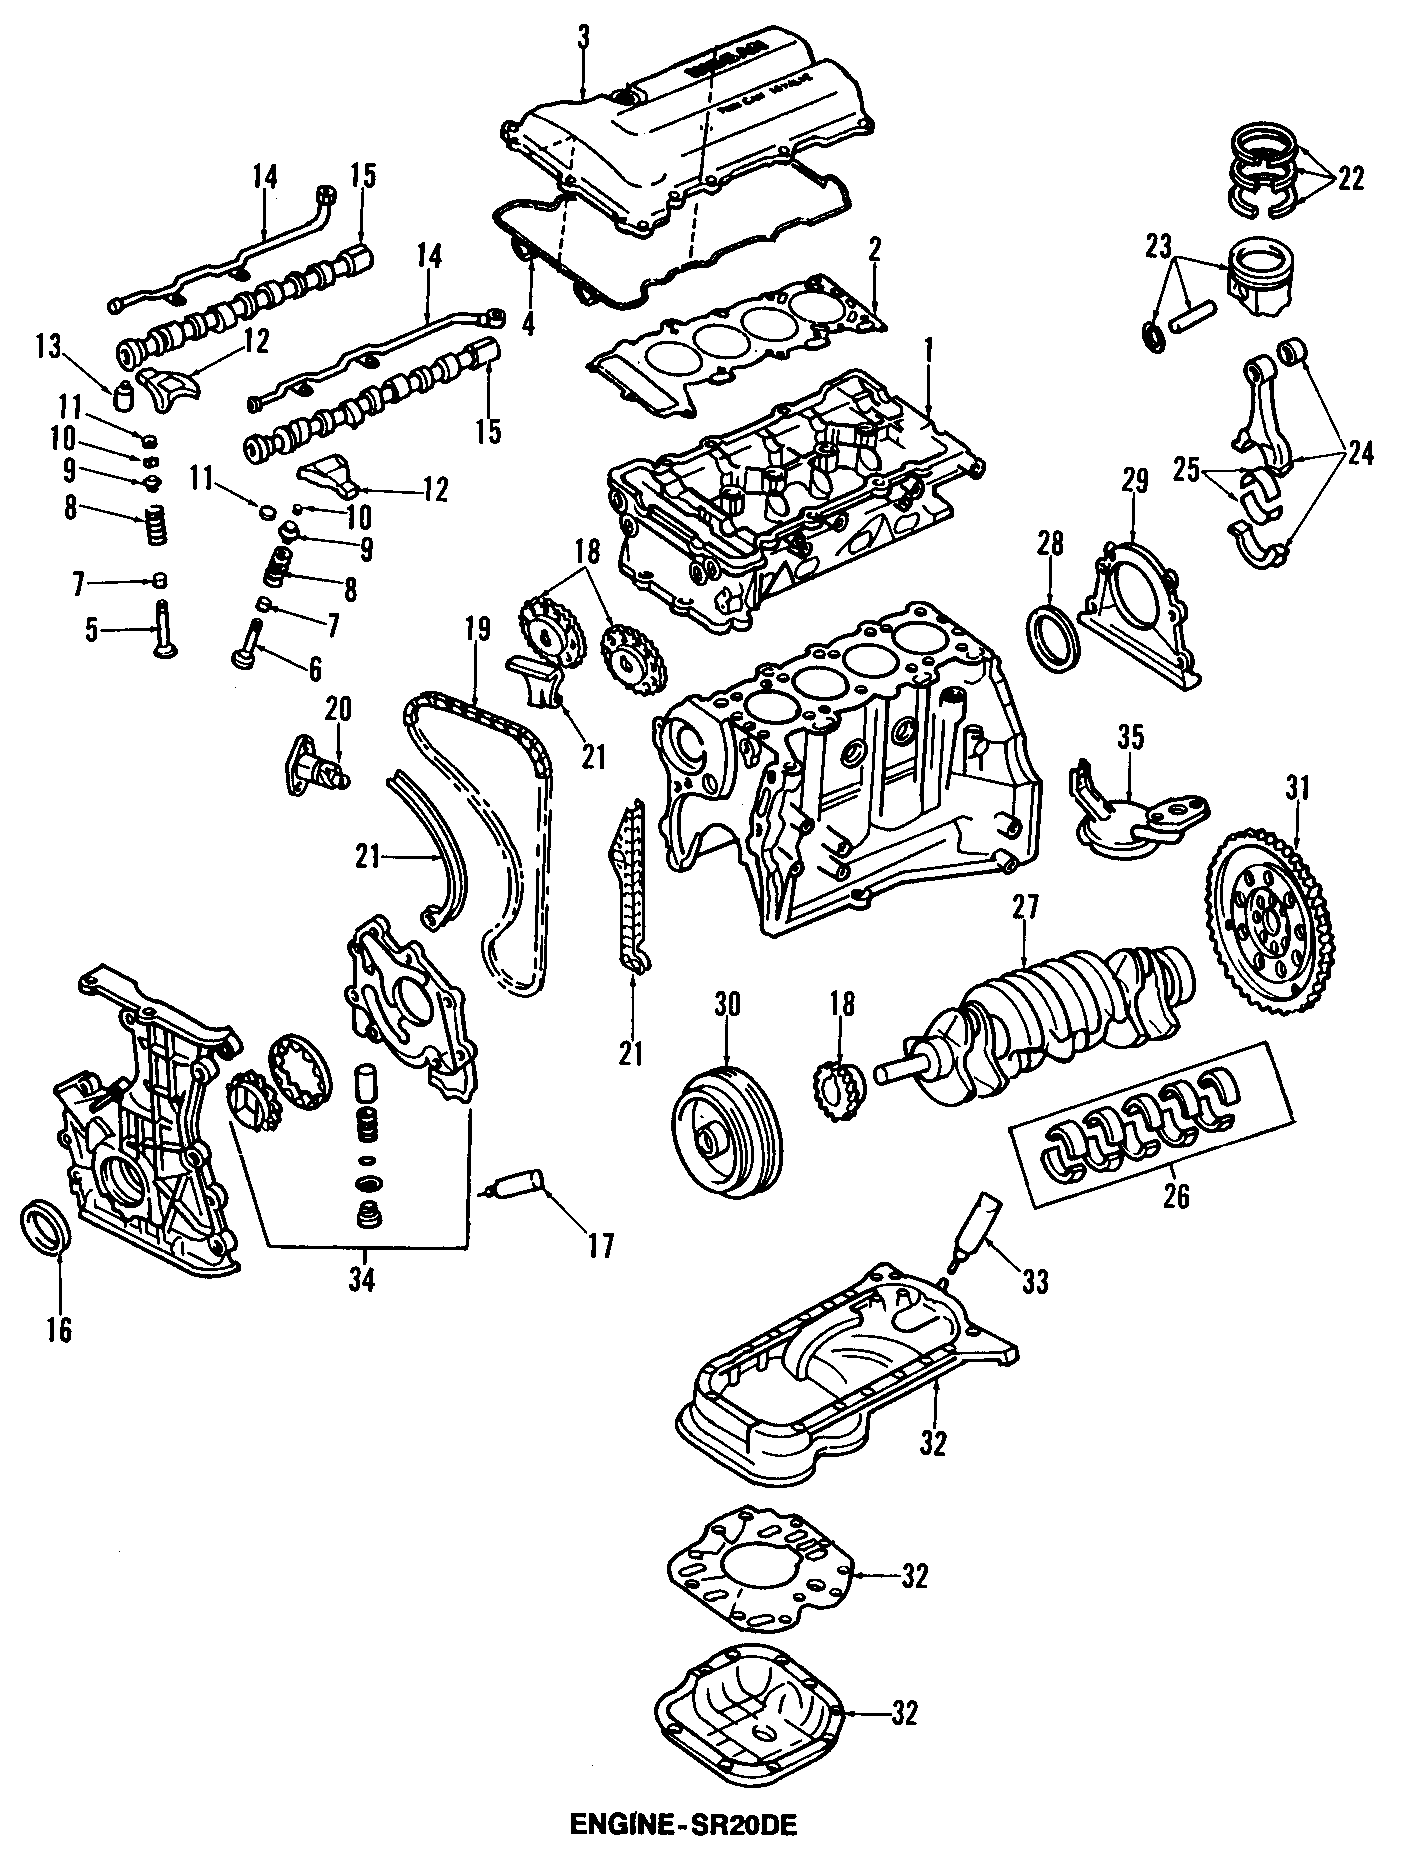 Nissan Sentra Engine Crankshaft Seal  Nok  Ndk  Liter